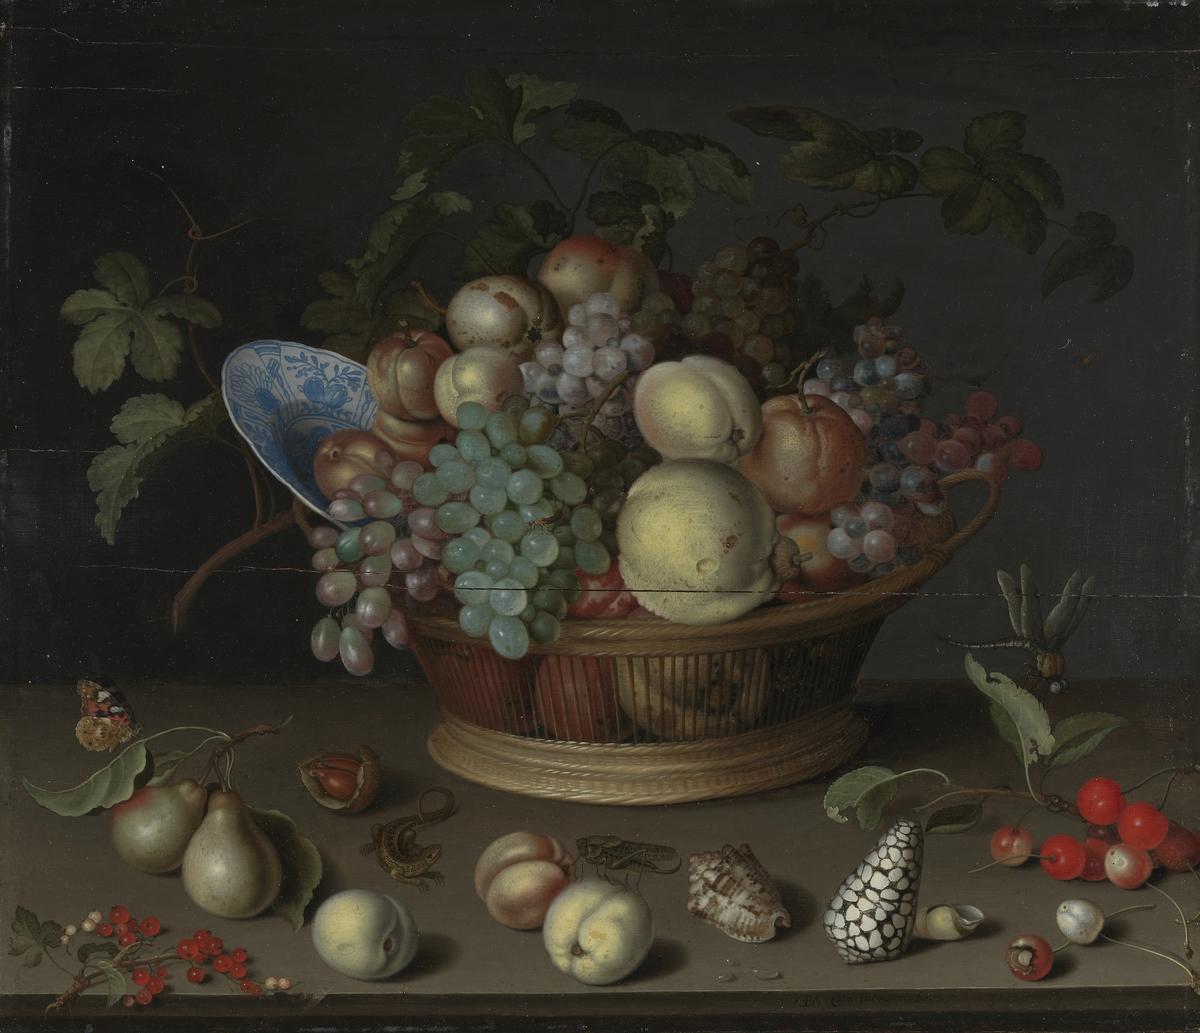 stilleben med frukt maleri nasjonalmuseet billedkunstsamlingene digitaltmuseum. Black Bedroom Furniture Sets. Home Design Ideas